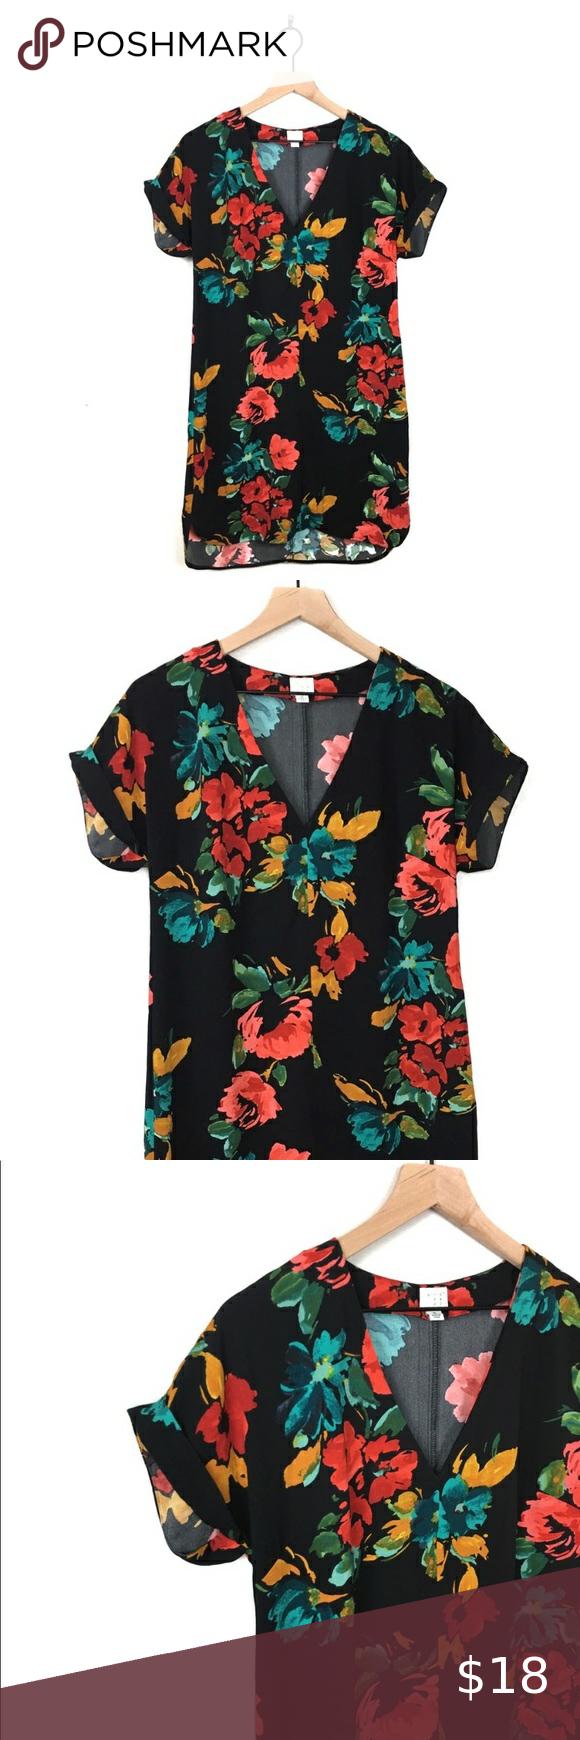 A New Day Target Black Floral Midi Shift Dress A New Day Target Xs Black Floral Dress With Back Butto Black Floral Shirt Midi Shift Dress Floral Shirt Dress [ 1740 x 580 Pixel ]